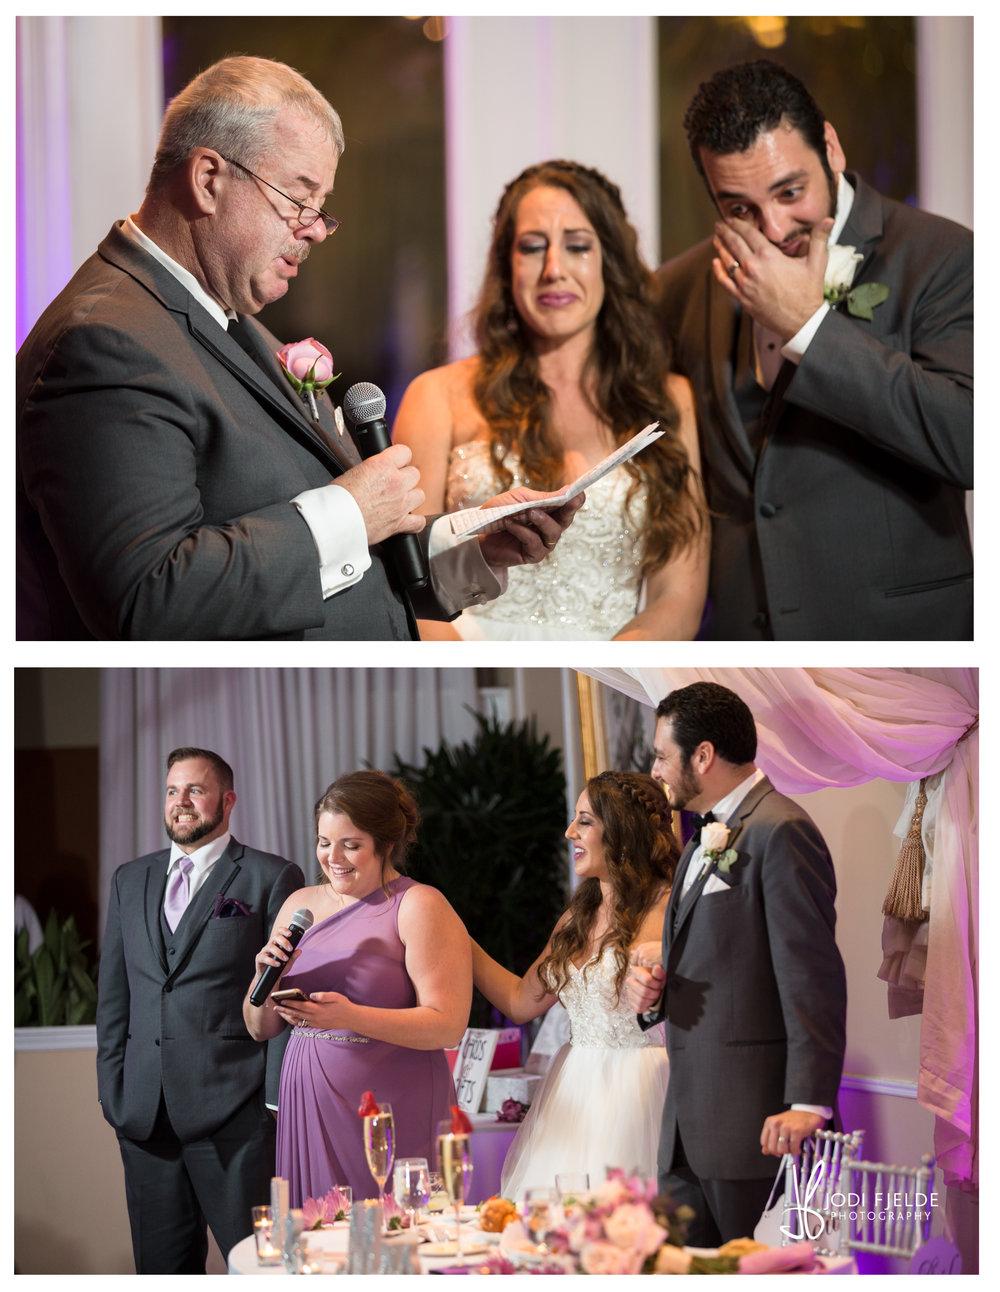 Boynton_Beach_Florida_ Benvenuto_Wedding_Heather__Doug_Married_22.jpg